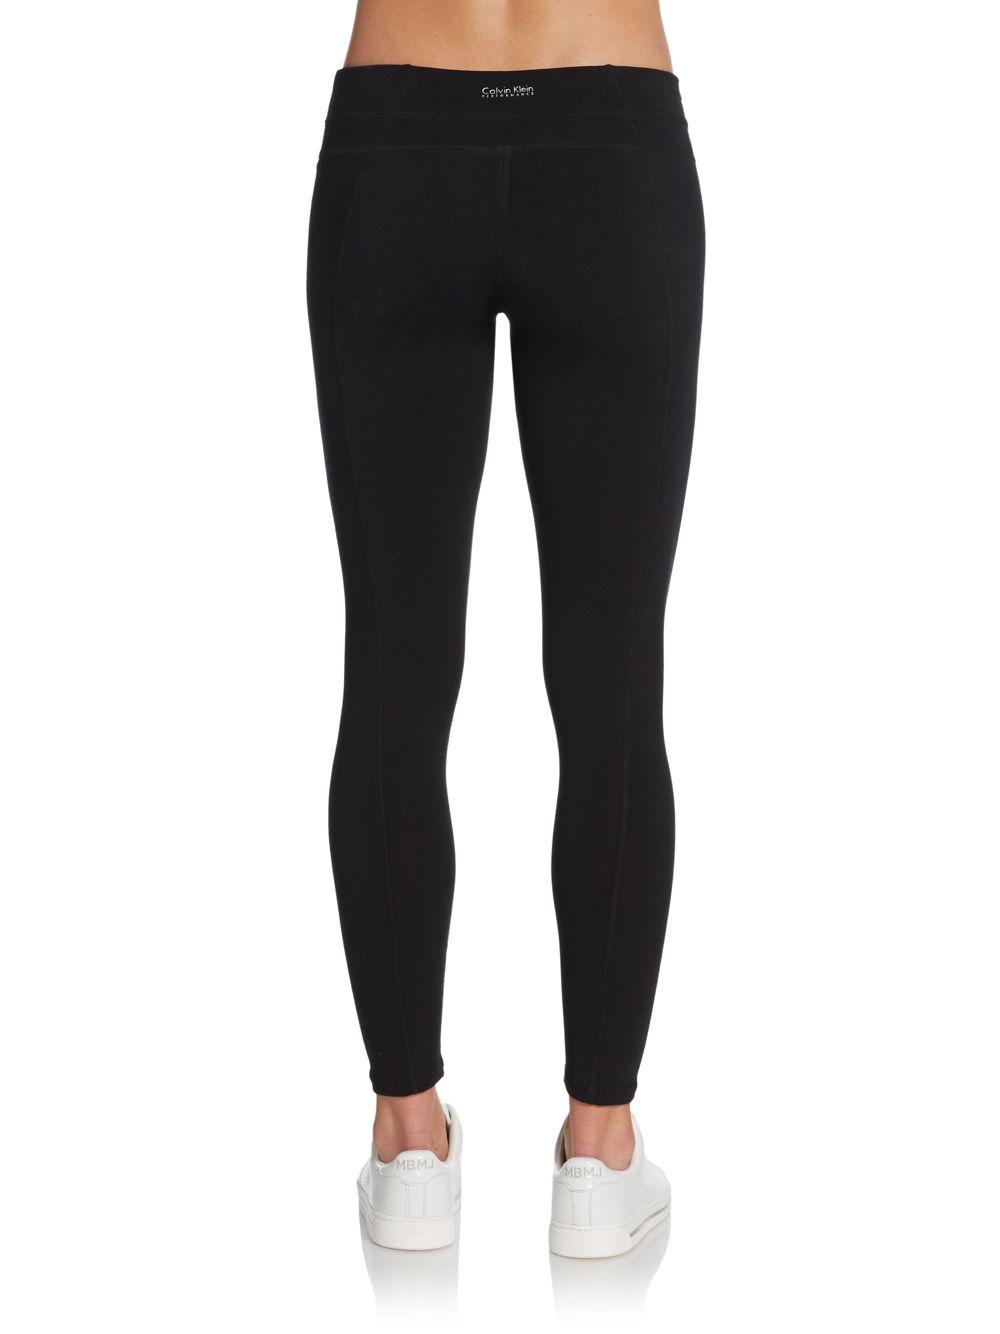 6dbb8e29df29a Lyst - Calvin Klein Seamed Leggings in Black calvin klein performance  leggings with pockets